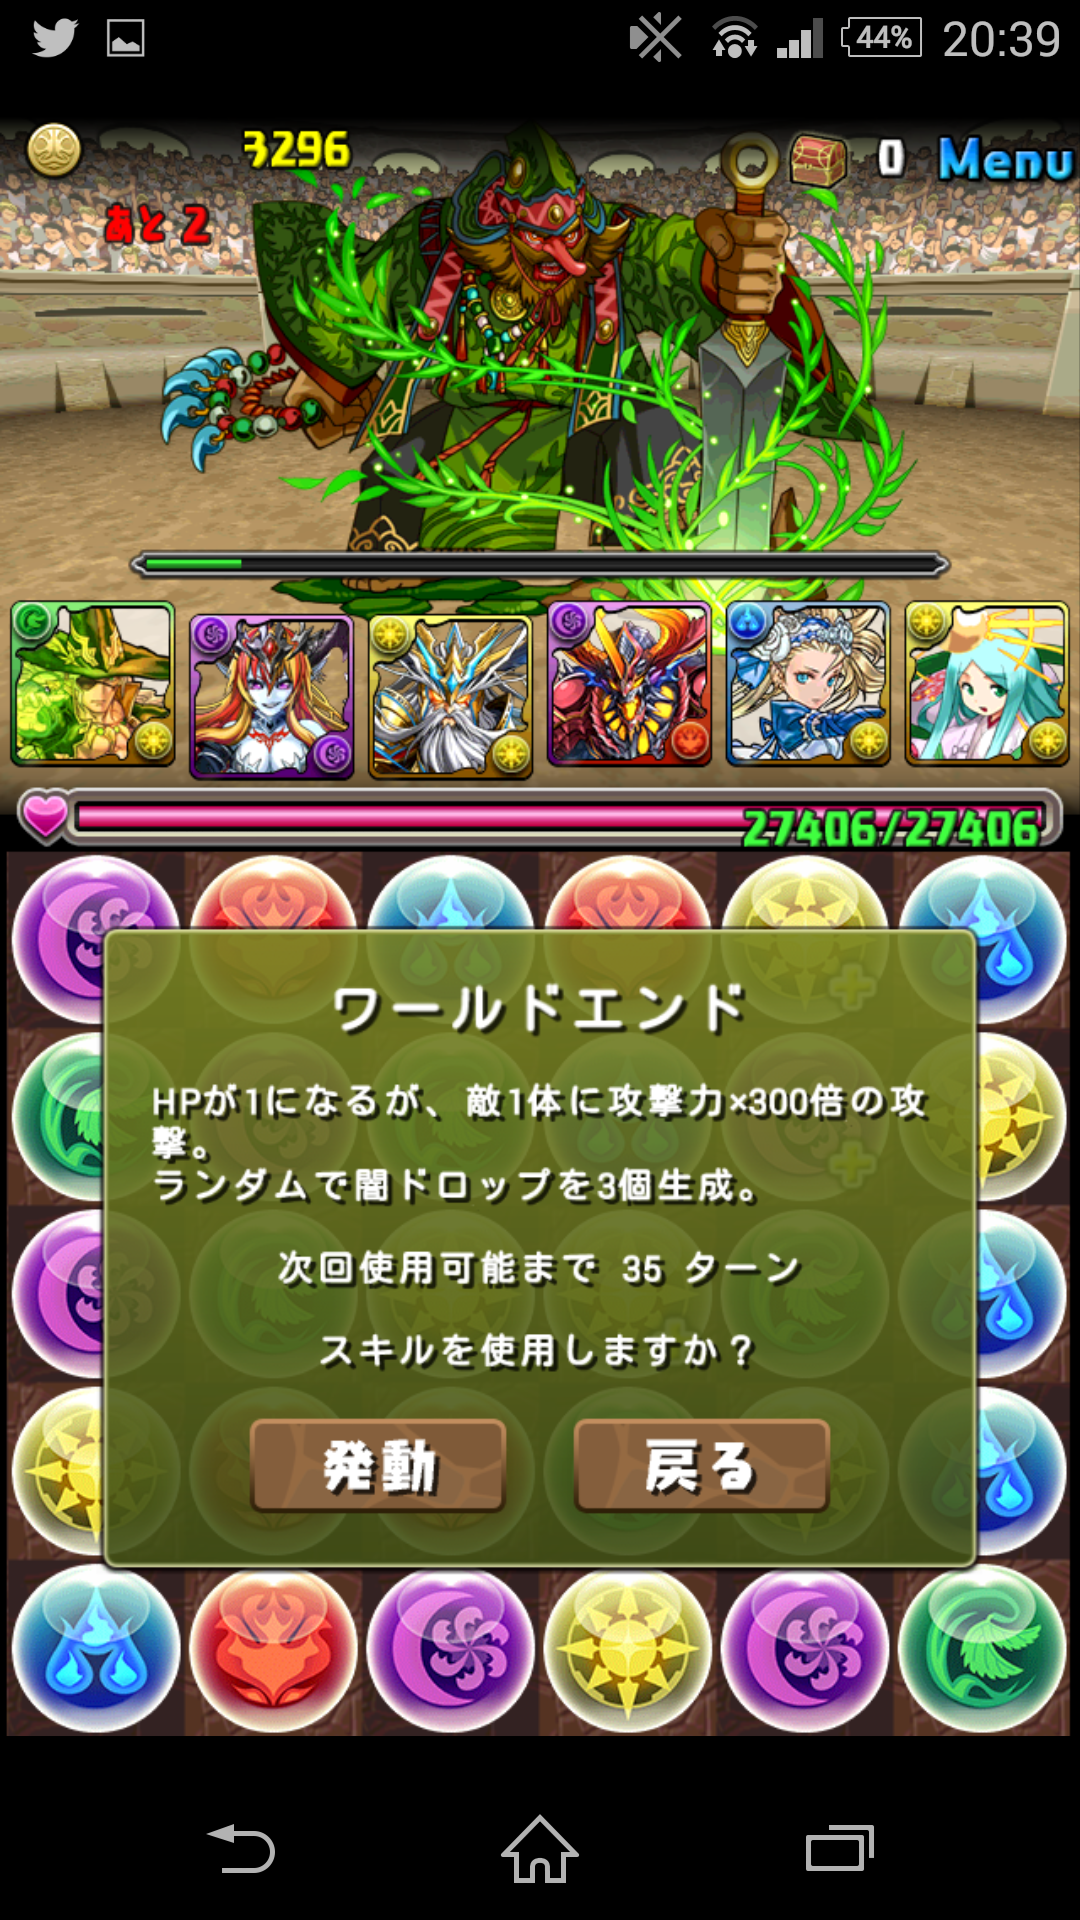 Screenshot_2015-01-29-20-39-44.png